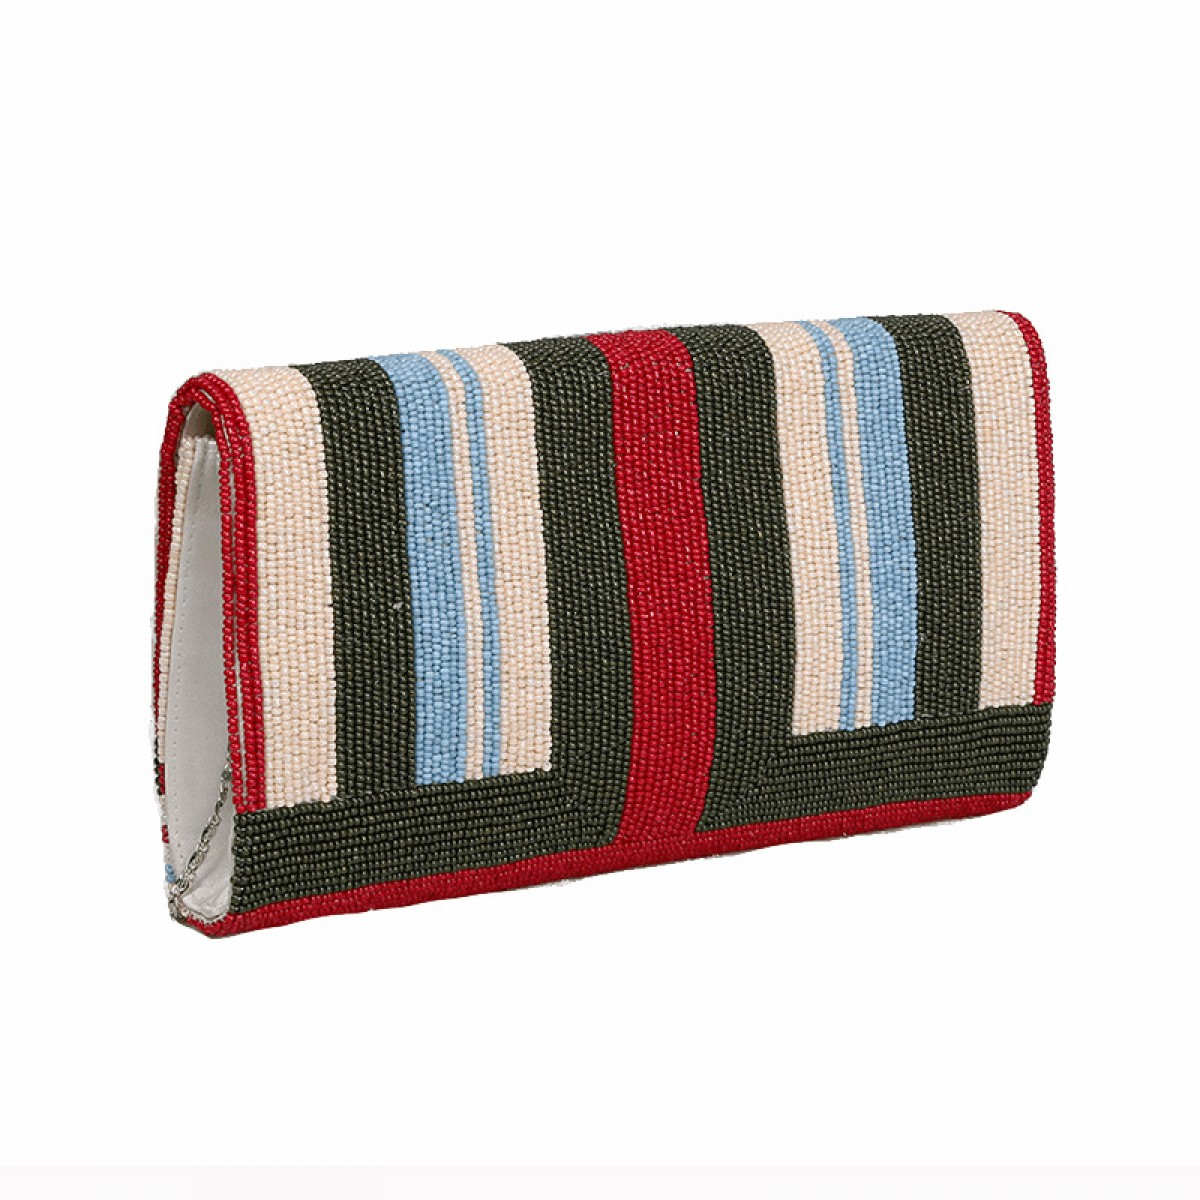 Beaded Evening Clutch Bag - Multi Color